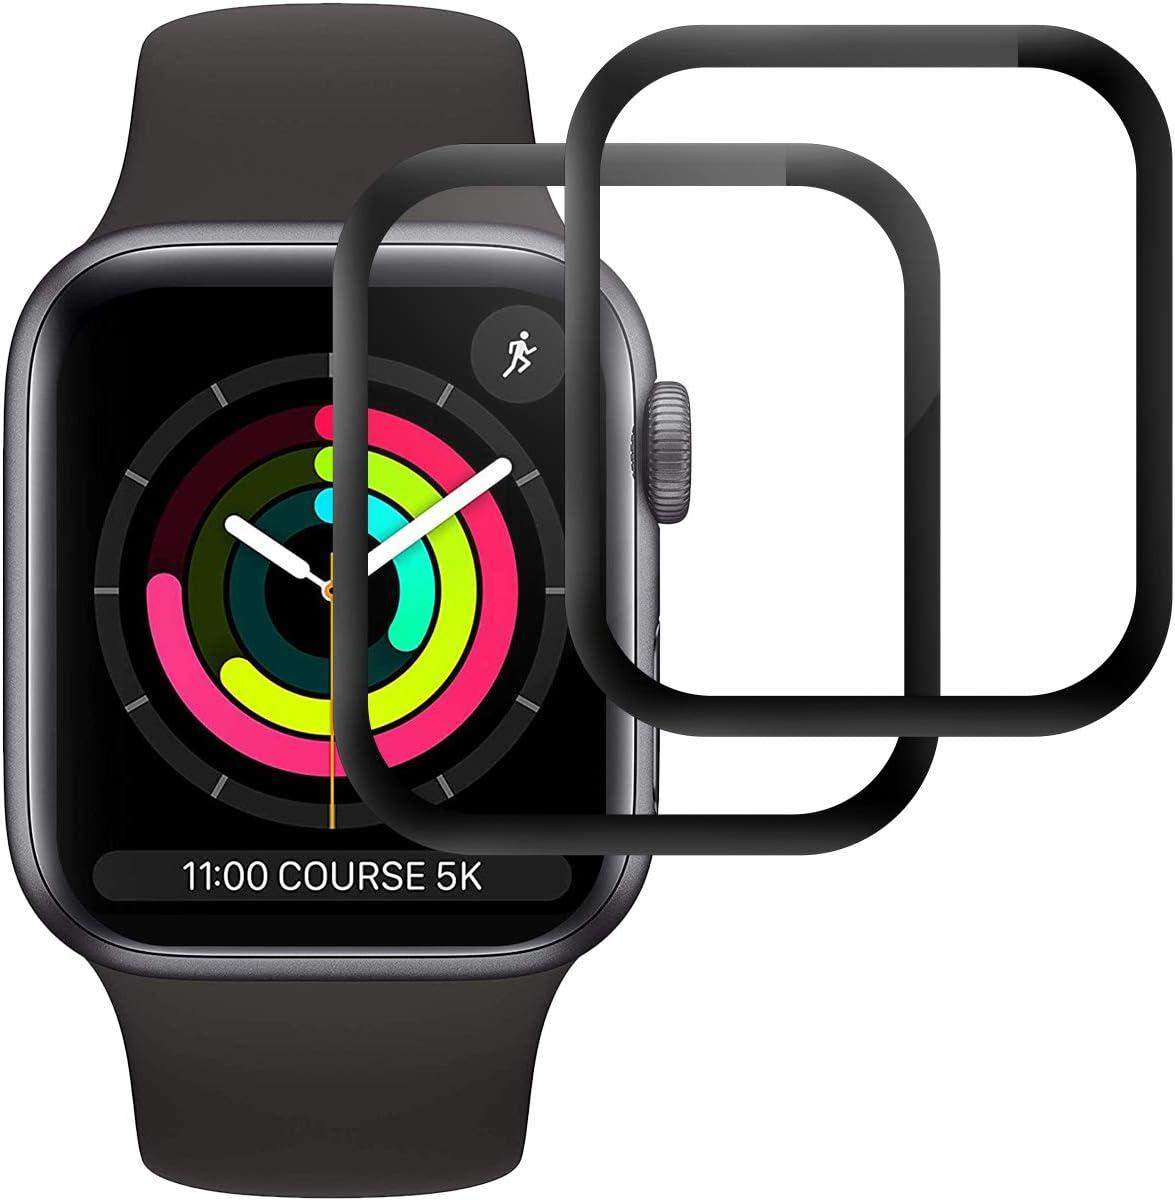 RIIMUHIR Cristal Templado para Apple Watch Series 5/Series 4 44mm,[2 Unidades] [3D Cobertura Completa] [Sin Burbujas] [Dureza 9H] Protector Pantalla para iWatch Series 5/Series 4 44mm